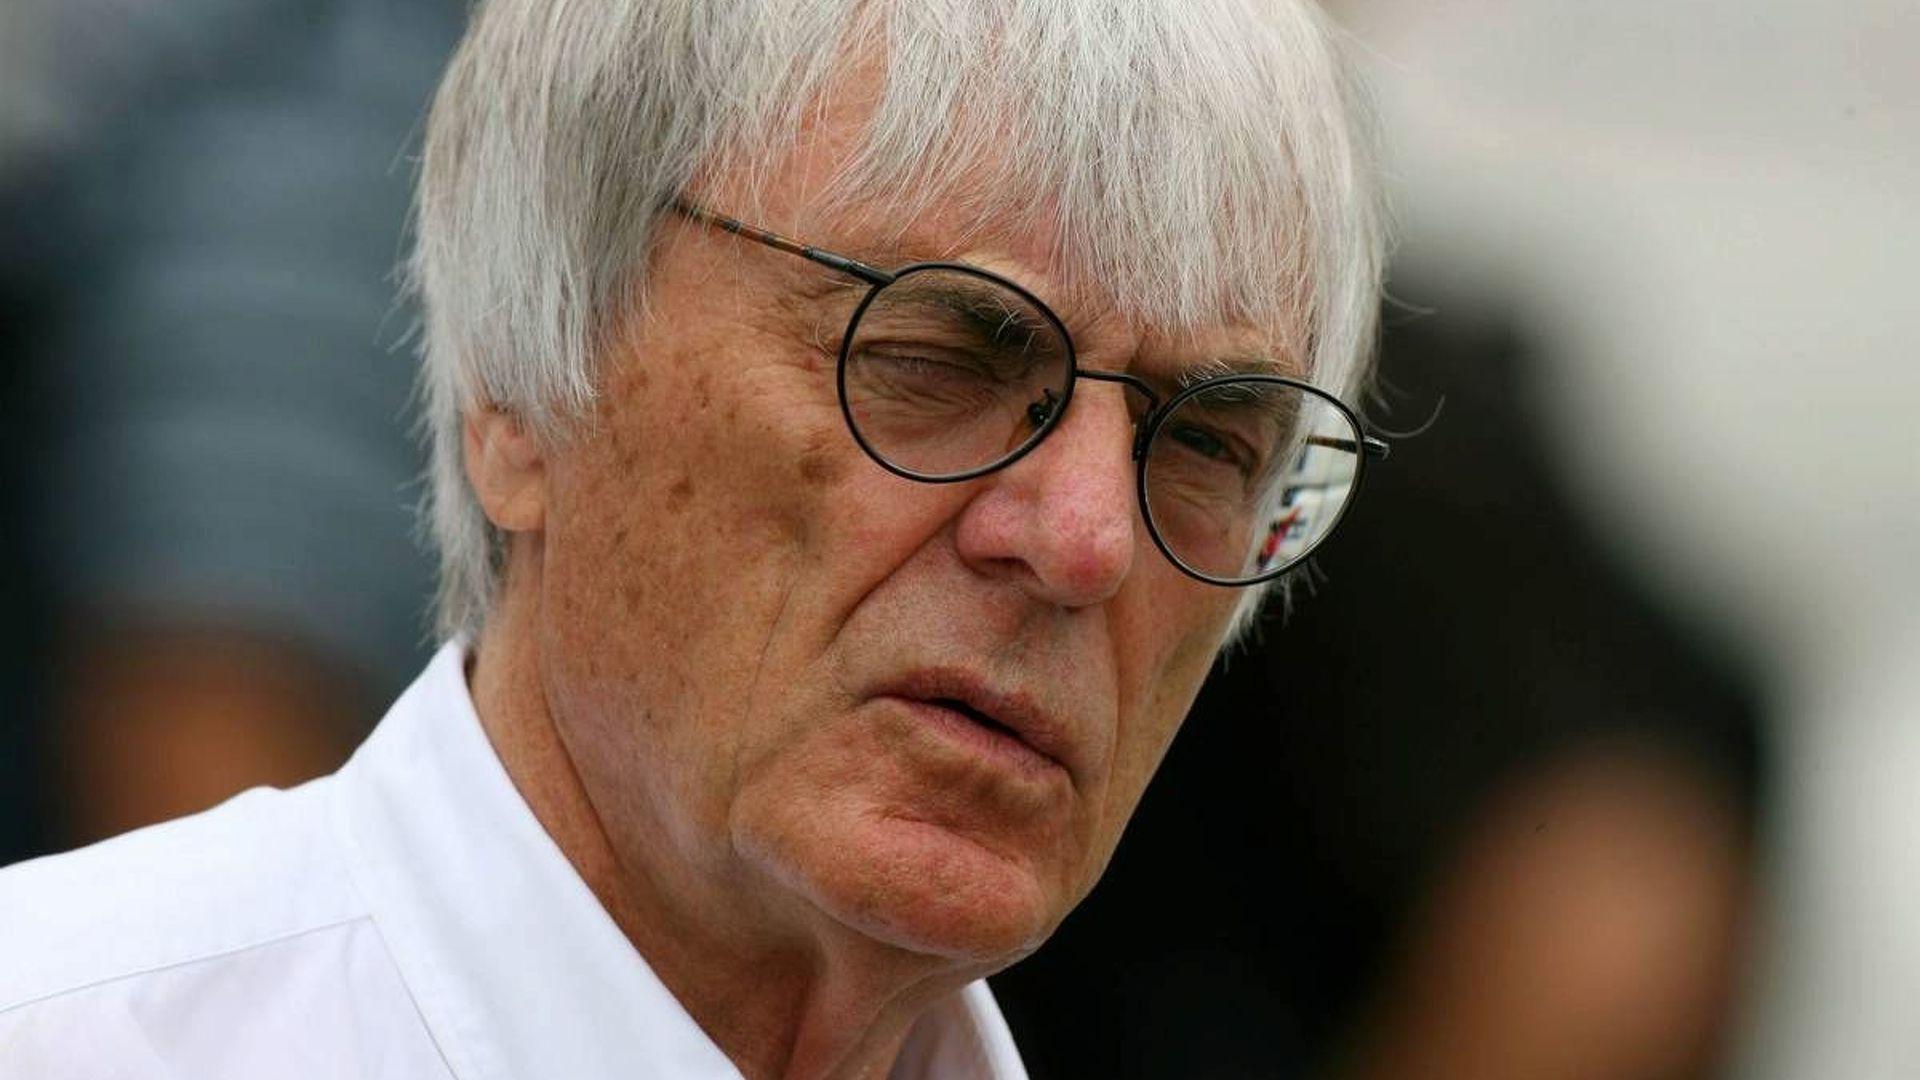 Ecclestone shows teams 18-race 2010 calendar